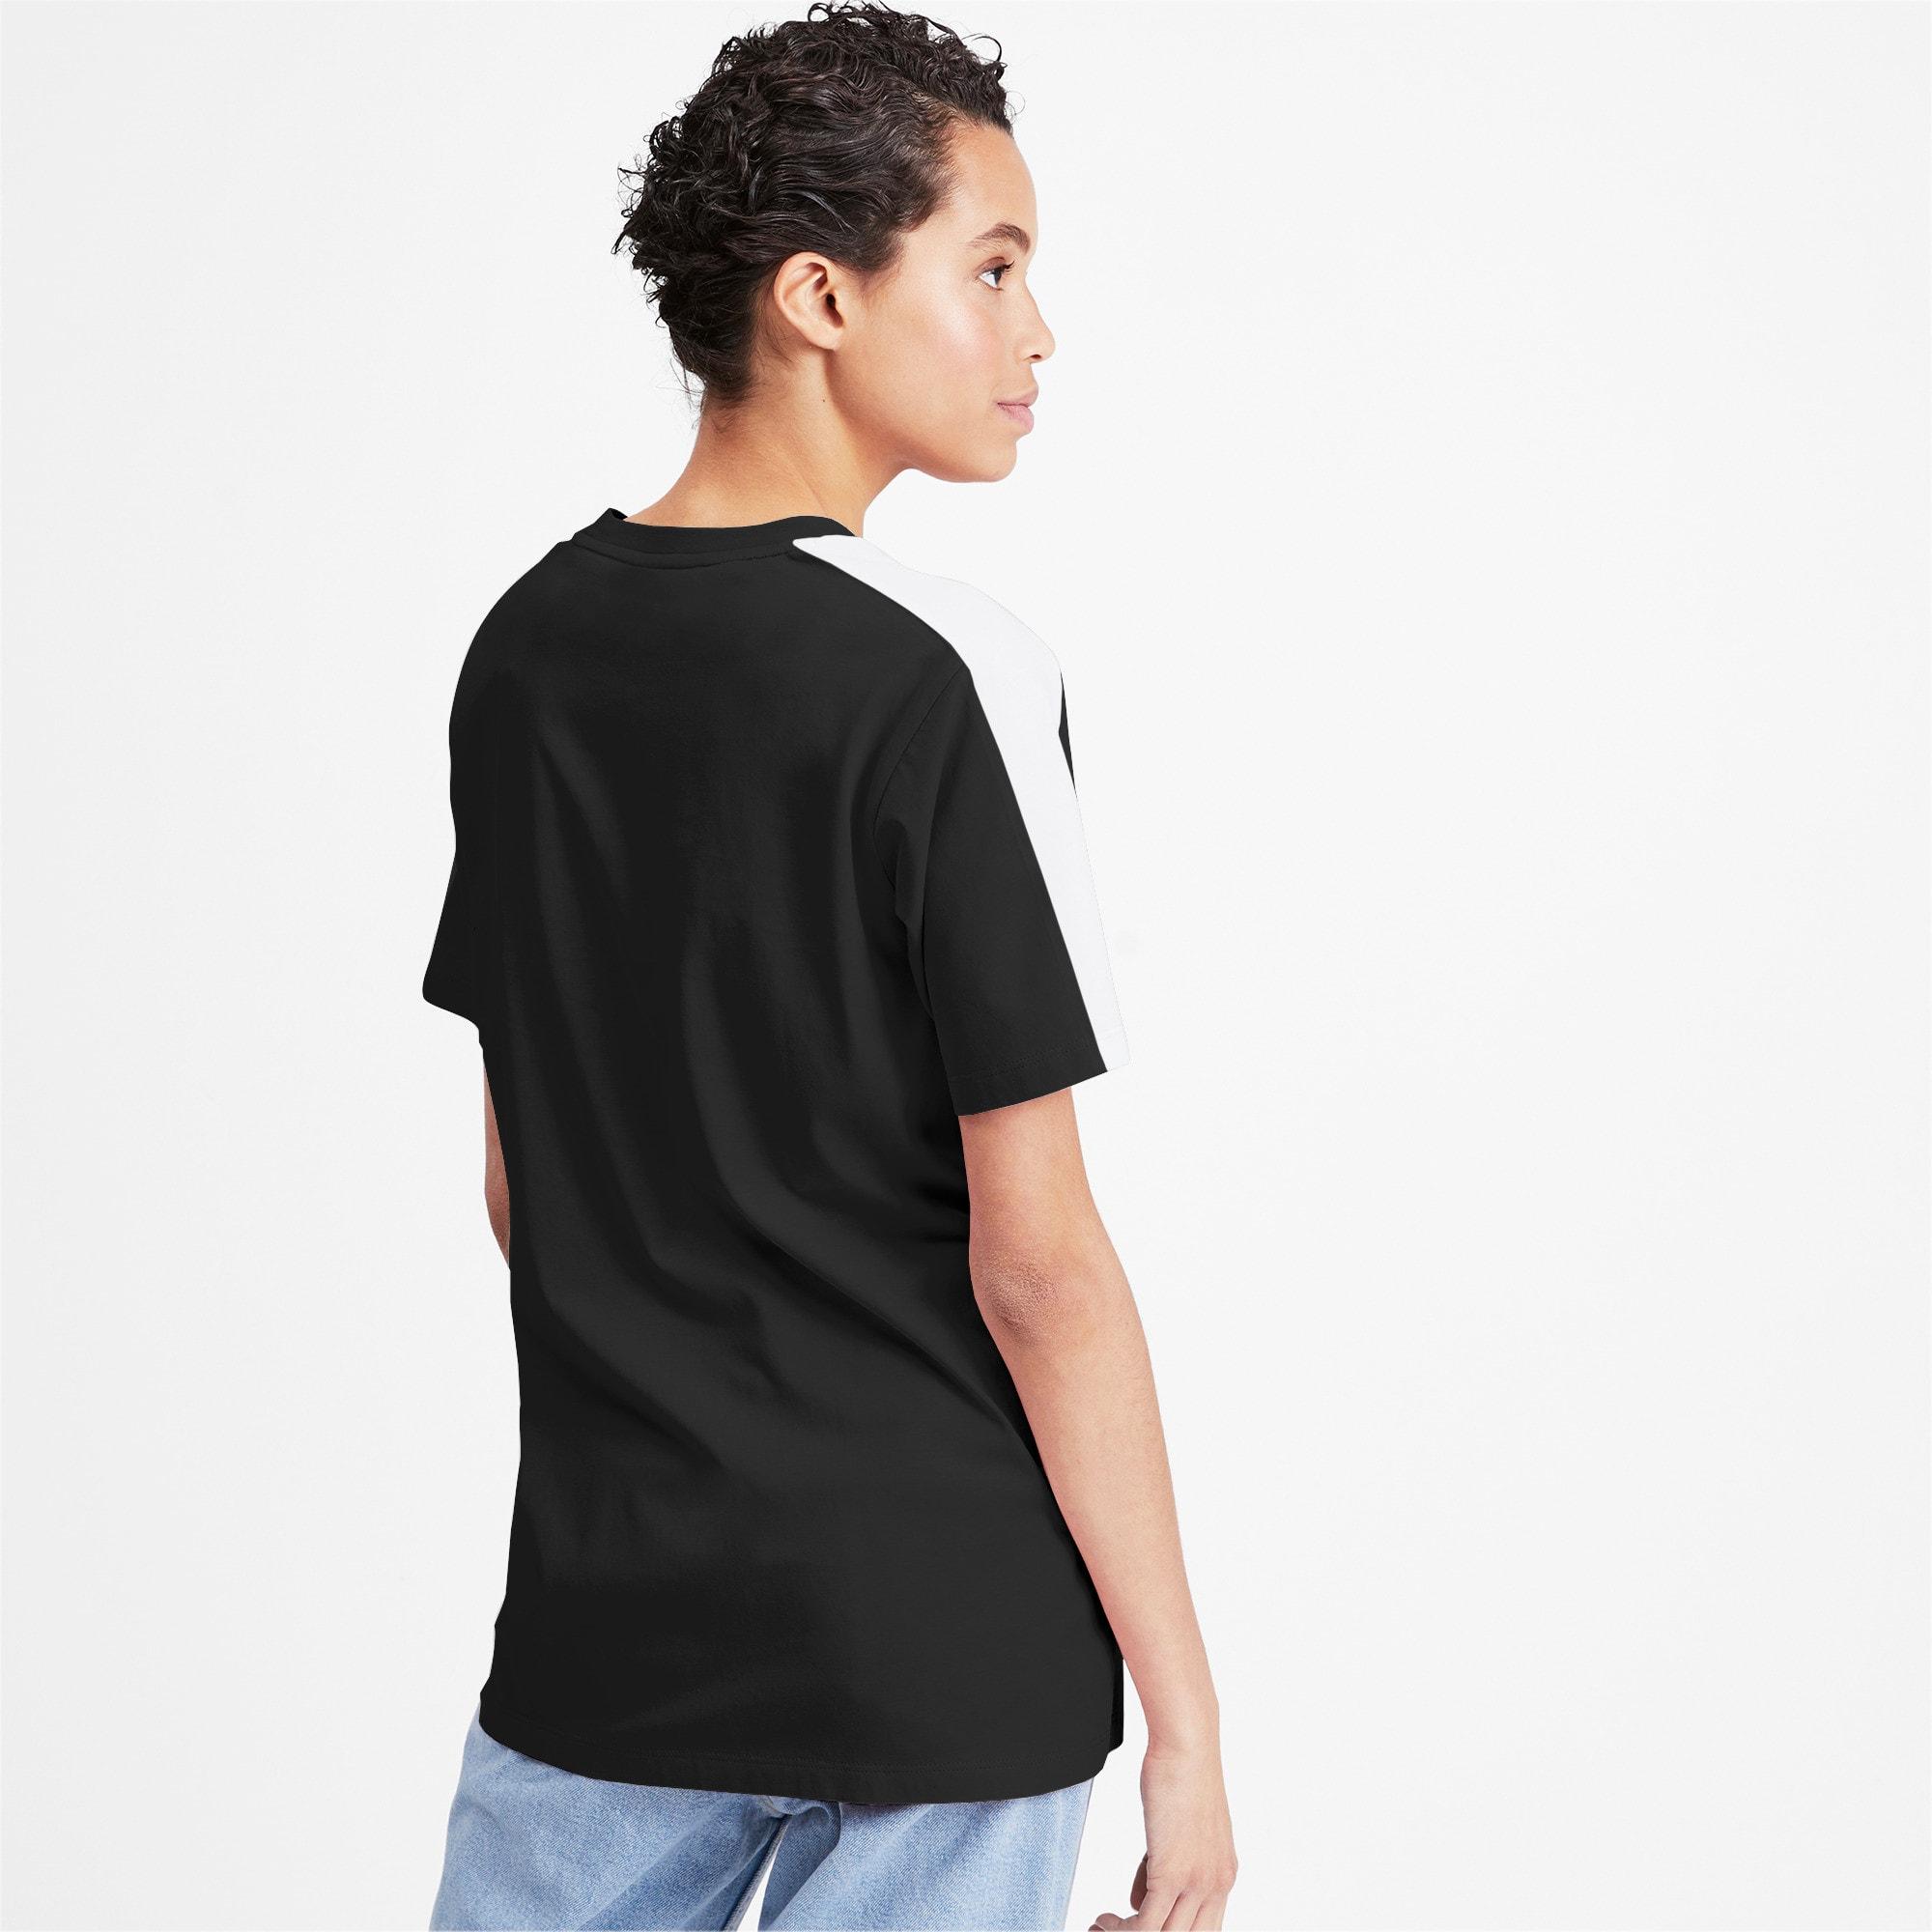 Miniatura 2 de Camiseta Classics T7 para mujer, Puma Black, mediano